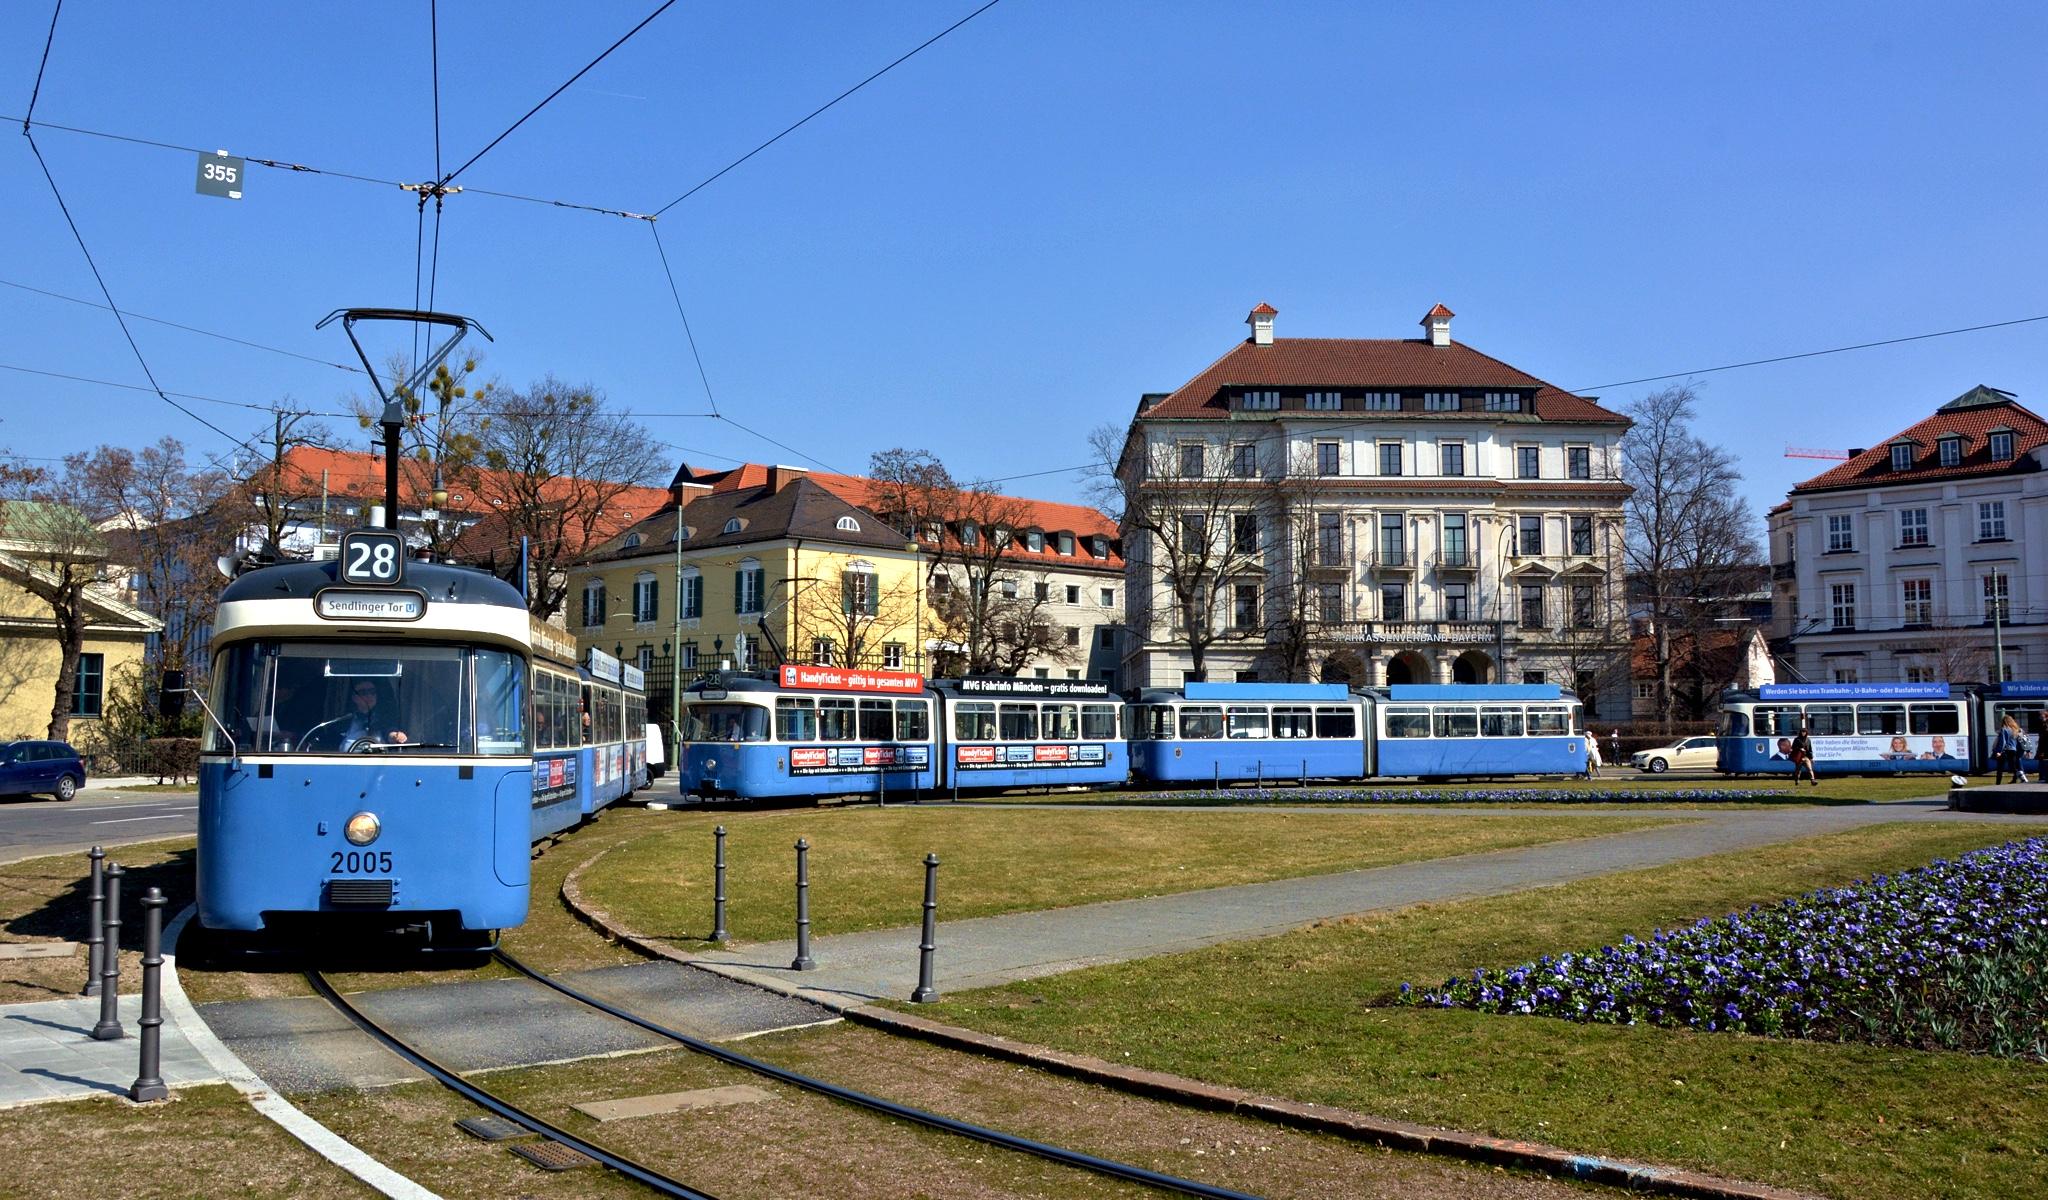 hintergrundbilder stadtbild fahrzeug zug seilbahn stadt tram transport m nchen 2010. Black Bedroom Furniture Sets. Home Design Ideas